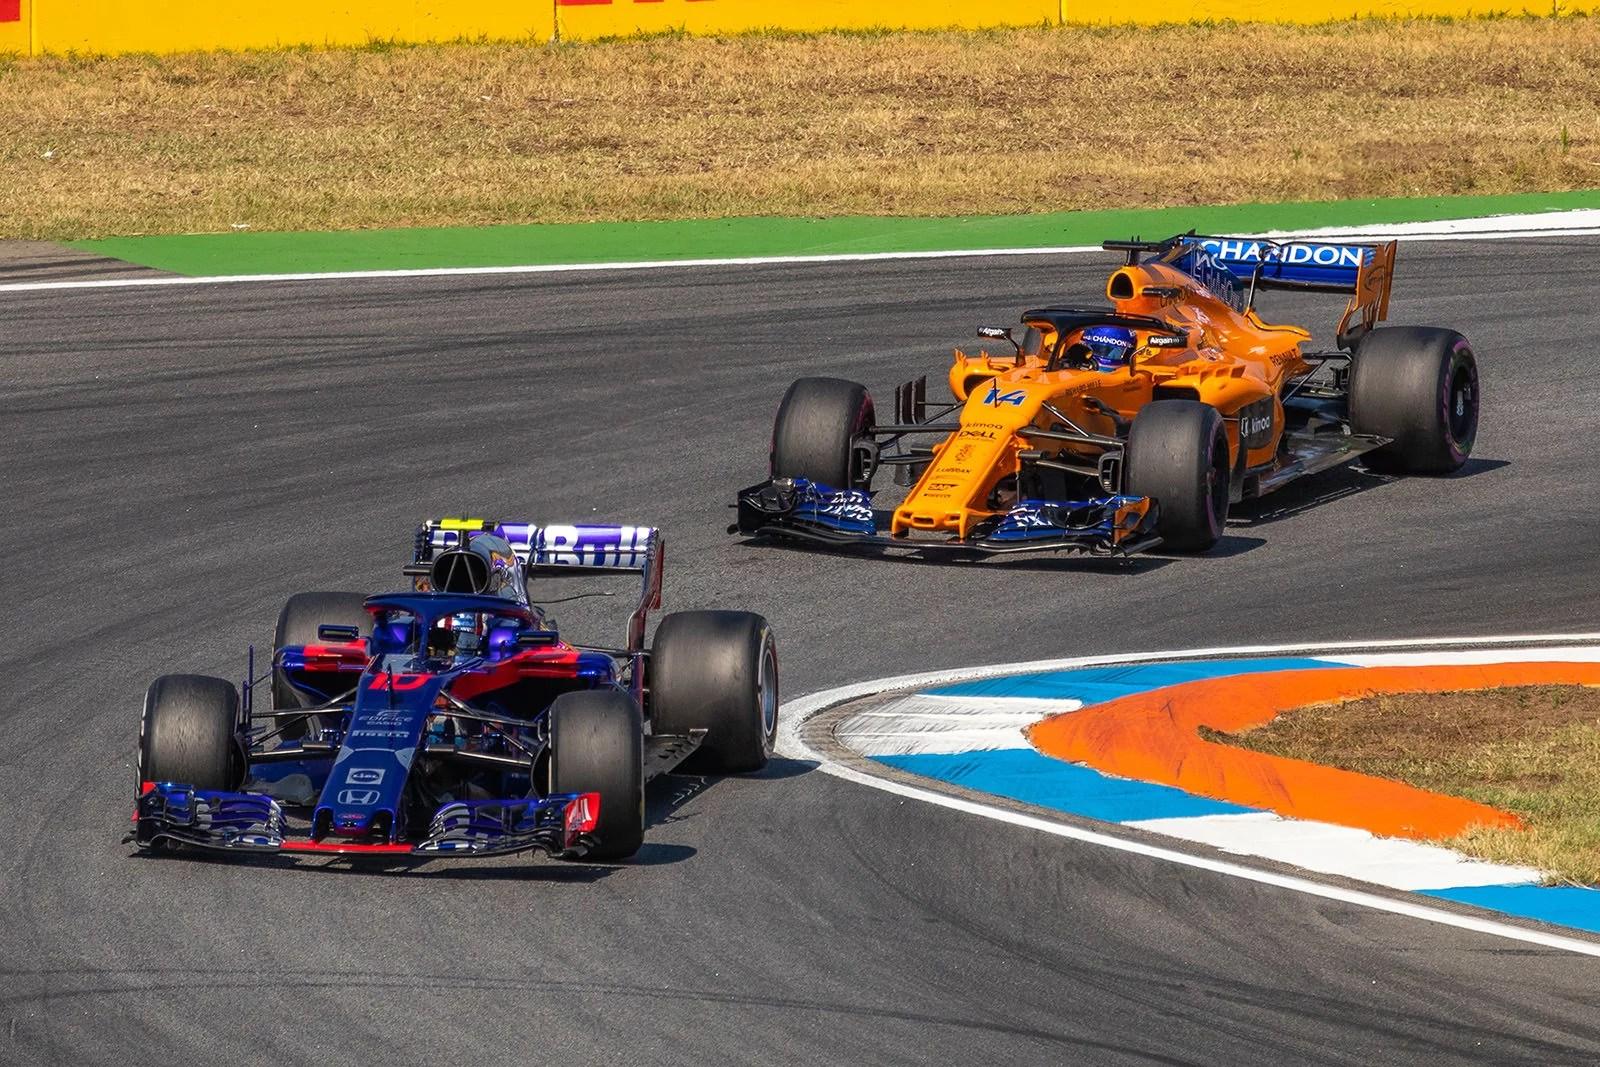 Formula 1 live in Hockenheim 2018